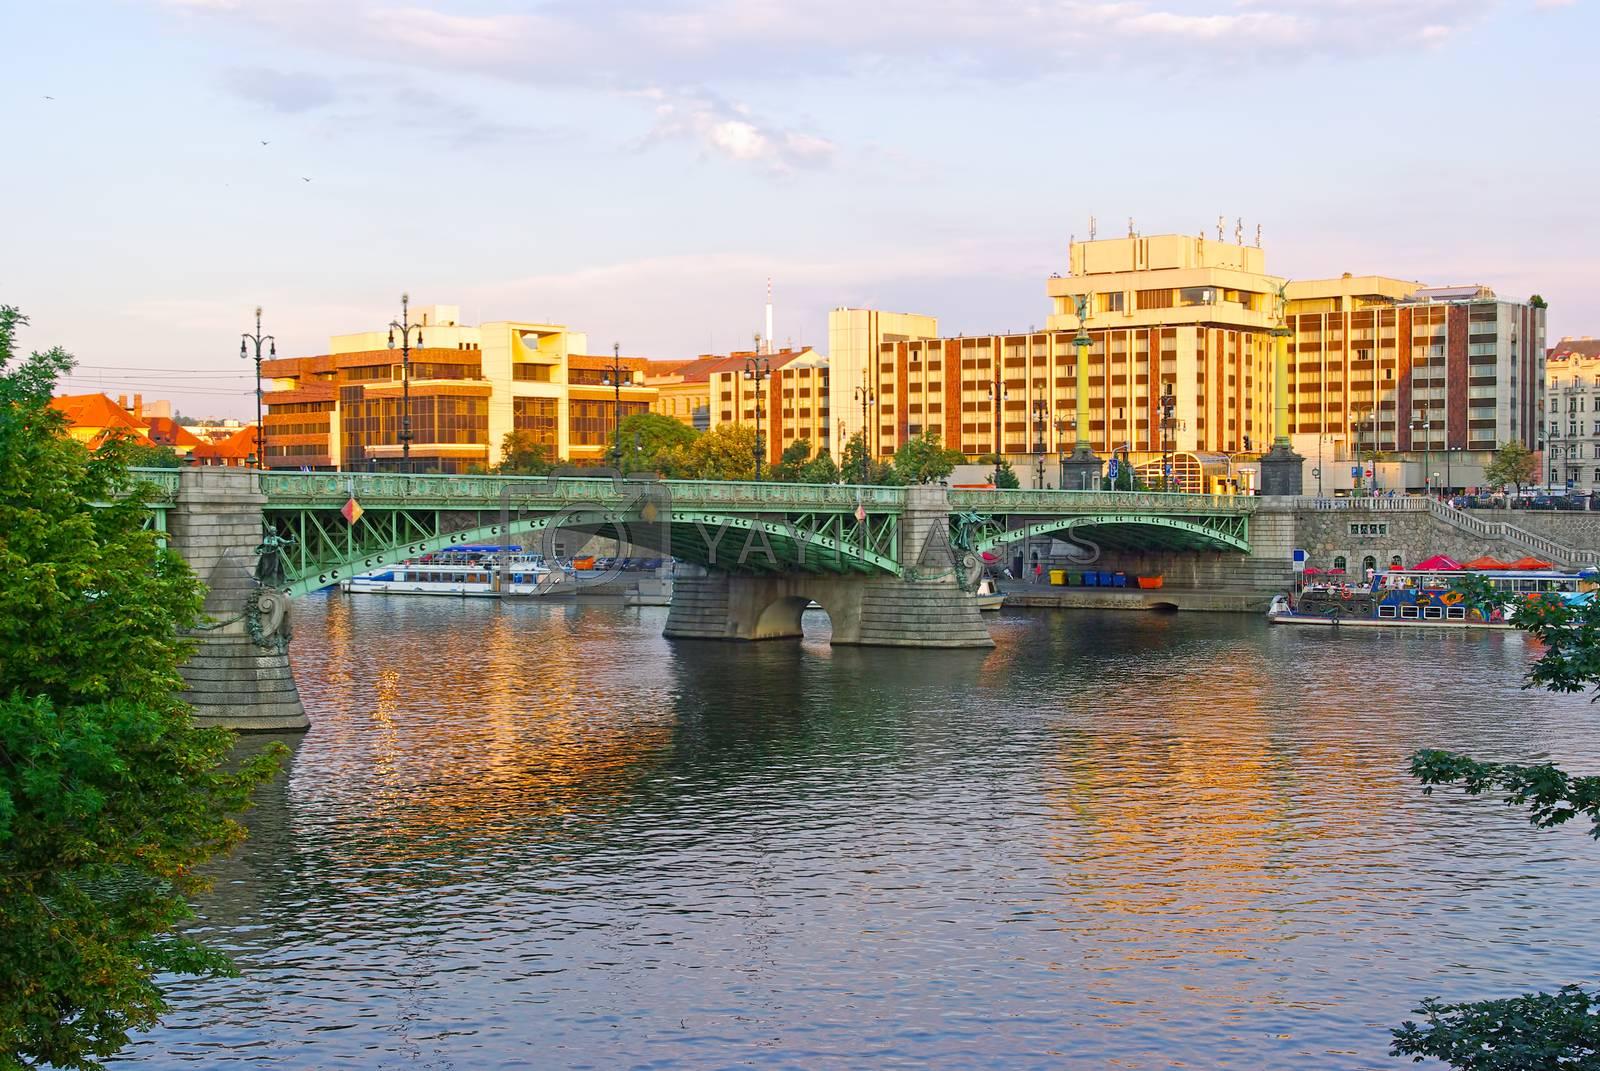 Cech bridge over Vltava river and Prague city before sunset